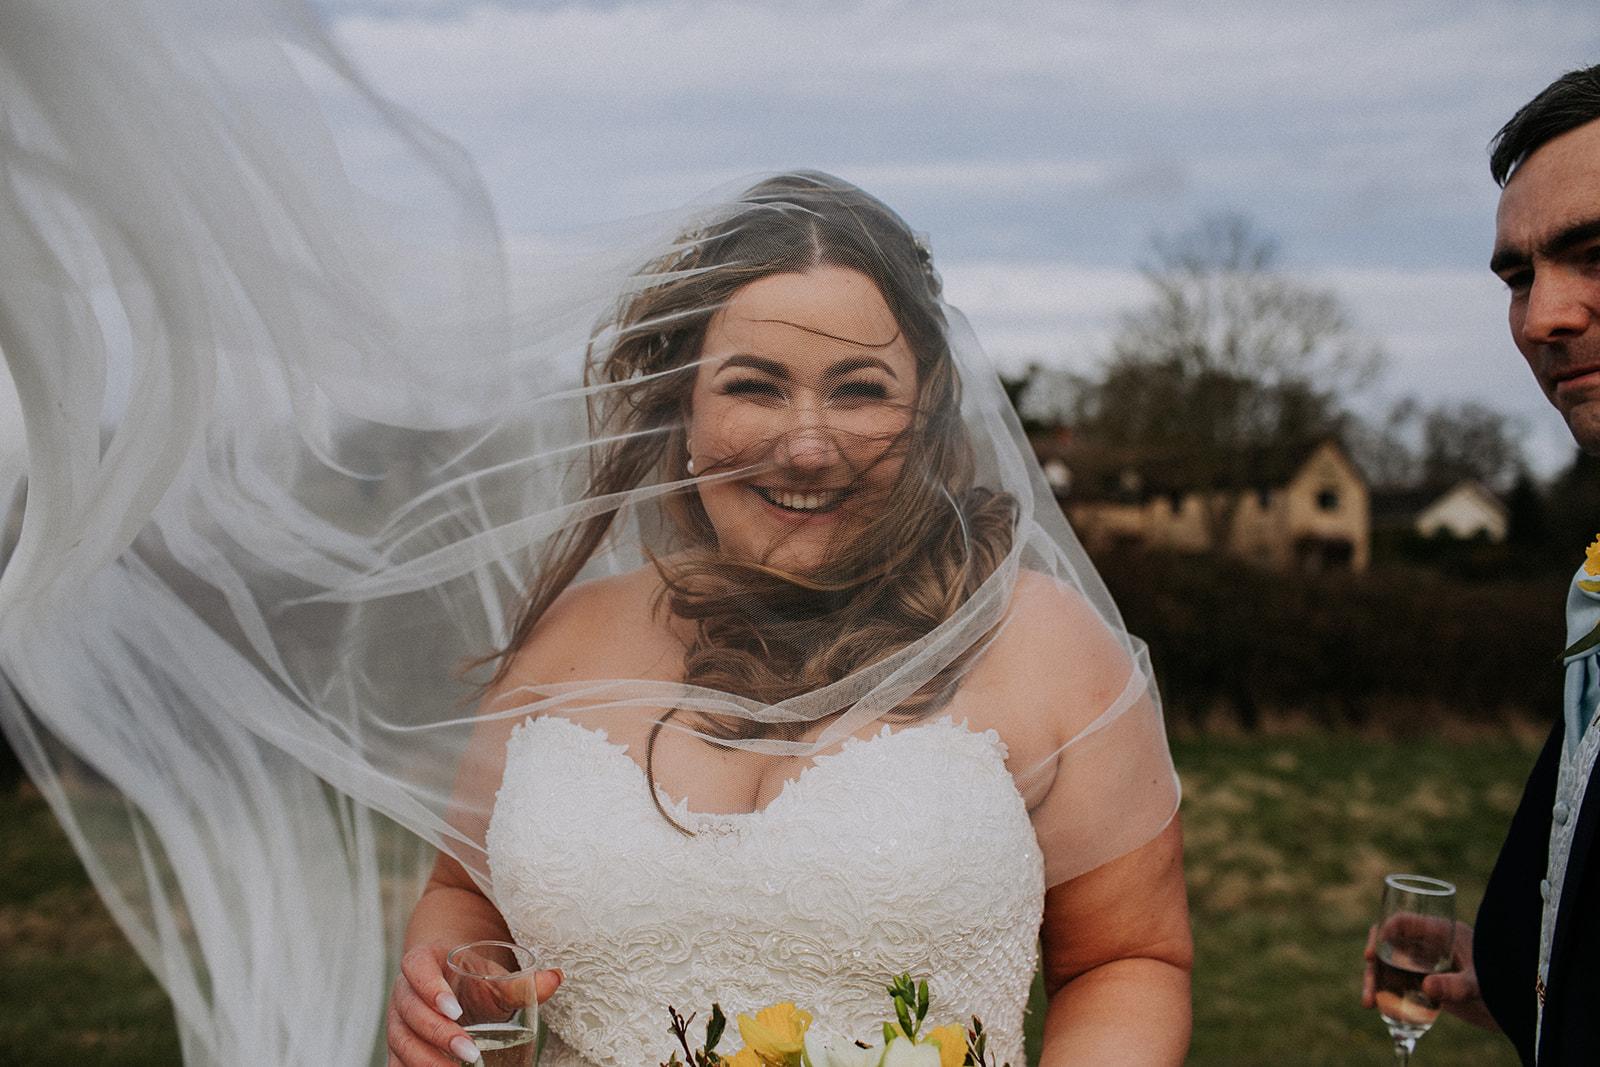 bride with veil blowing in the wind - rutland wedding - fun wedding - east midlands wedding planner - Leicestershire wedding planning - nottingham wedding planning